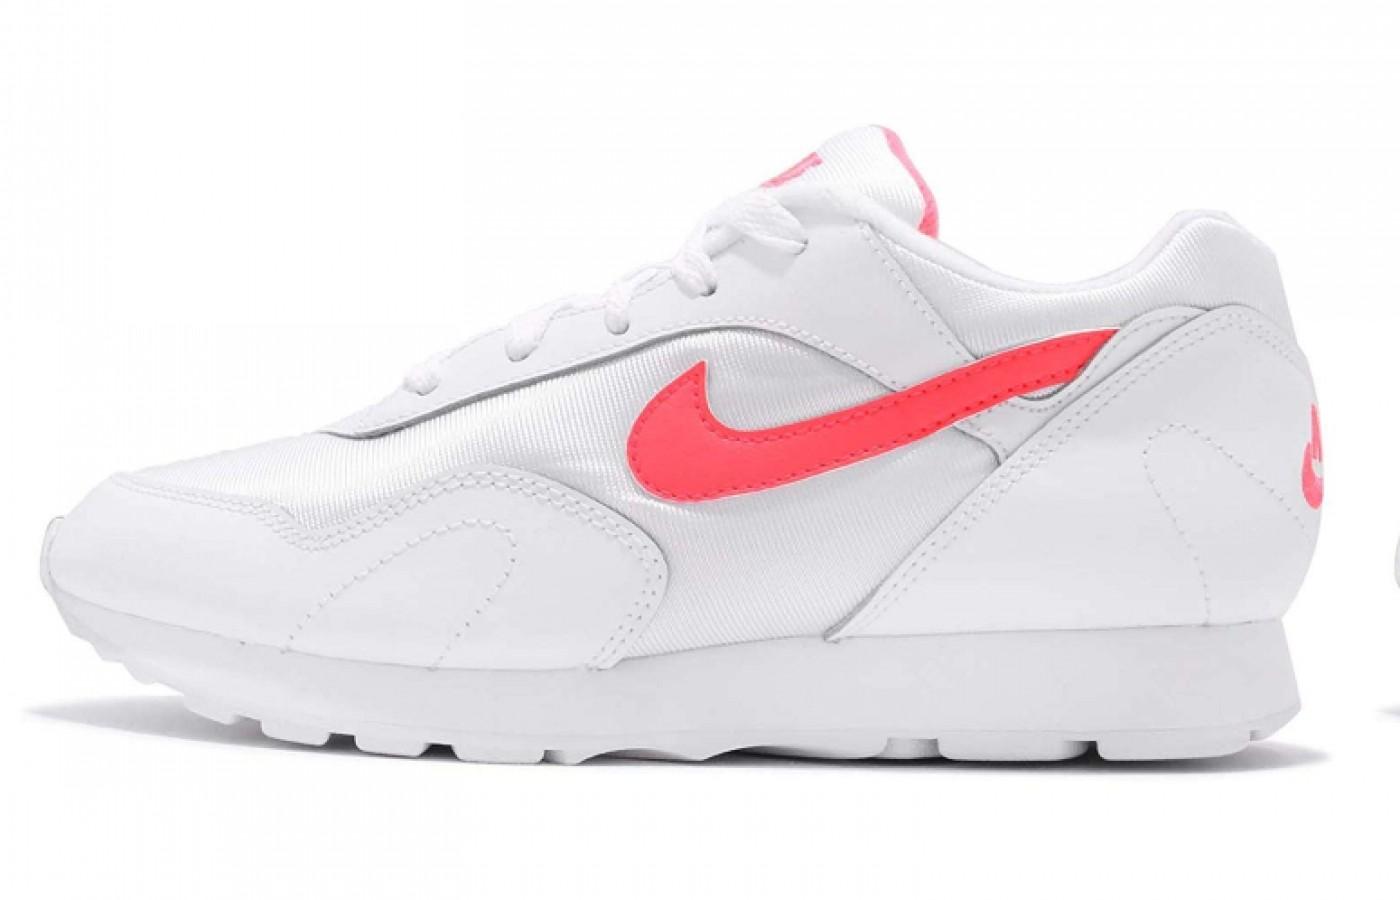 Nike Outburst Sneaker Outsole